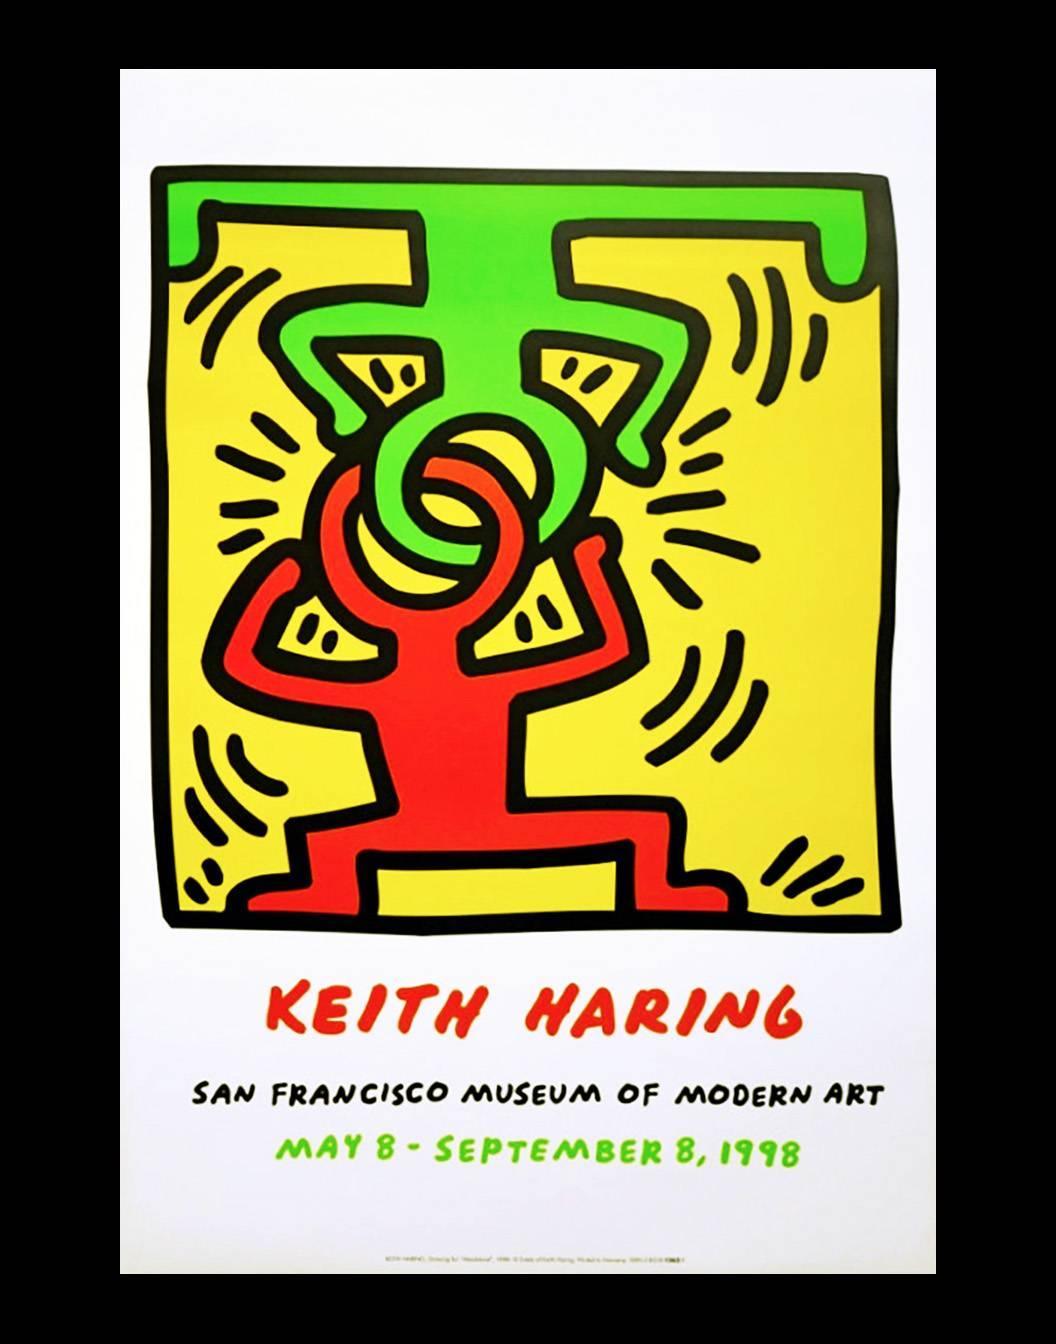 Vintage Keith Haring exhibition poster (Keith Haring San Francisco 1998)